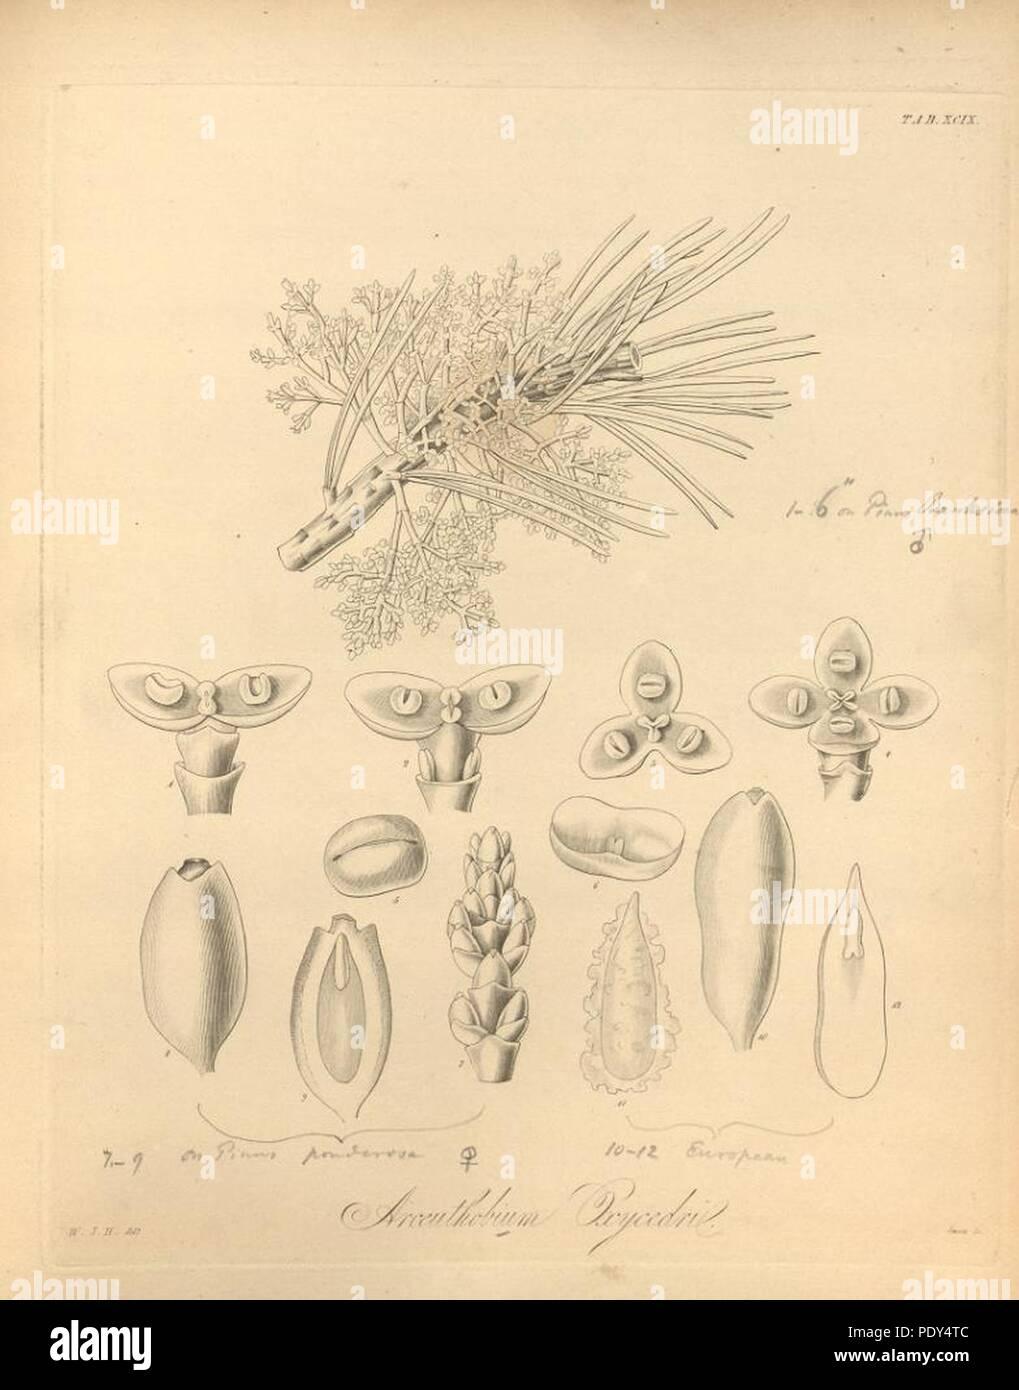 Arceuthobium oxycedri. - Stock Image